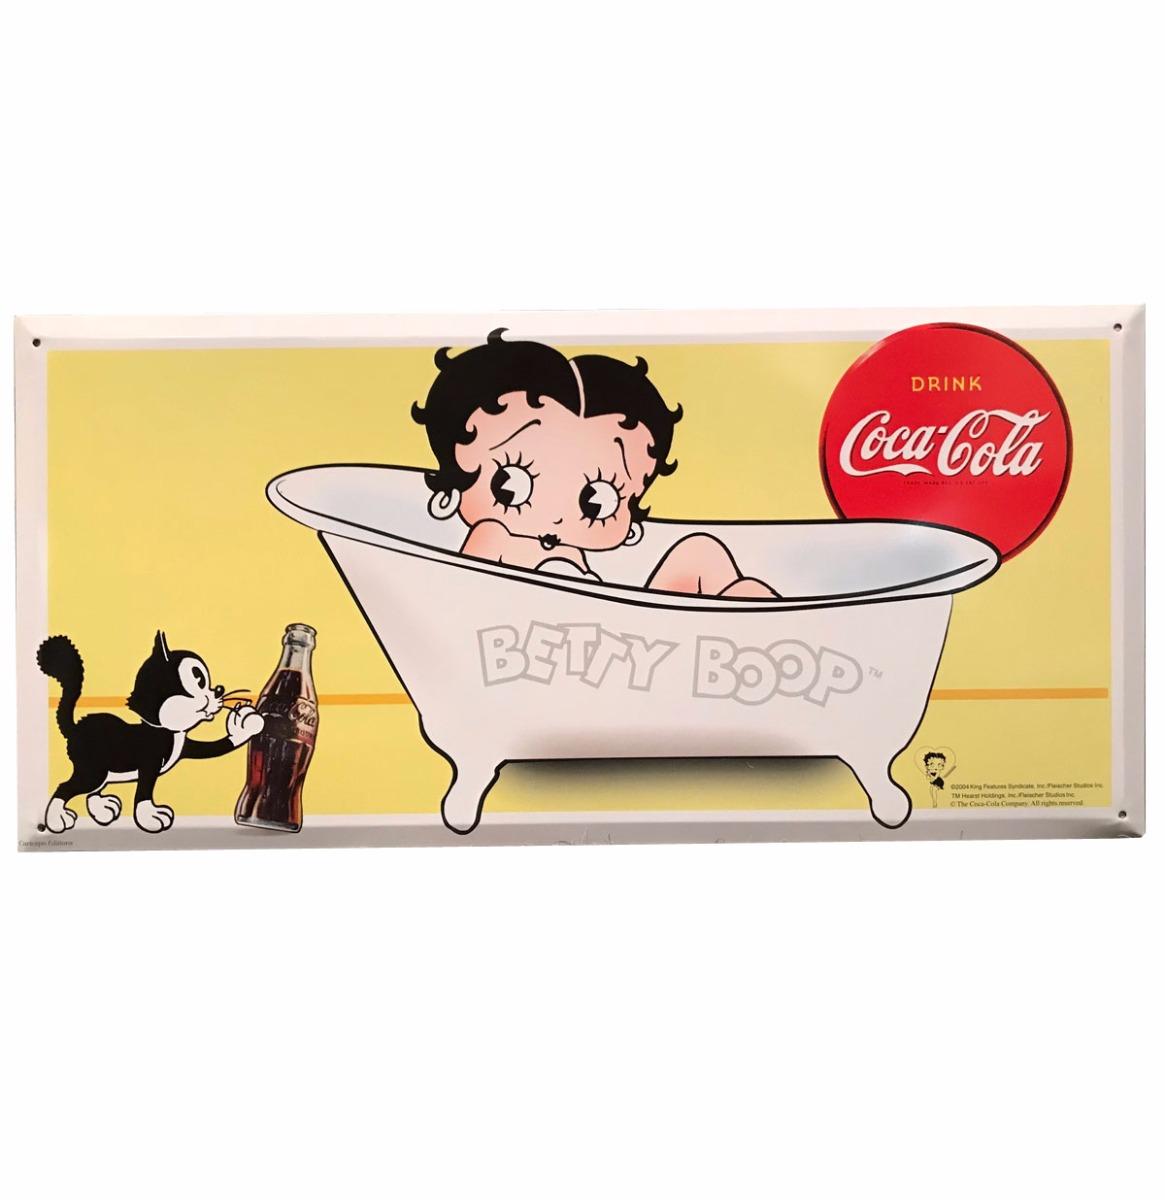 SUPER-DEAL: Betty Boop in Bad - Coca-Cola Metalen Bord 45 x 21,5 cm